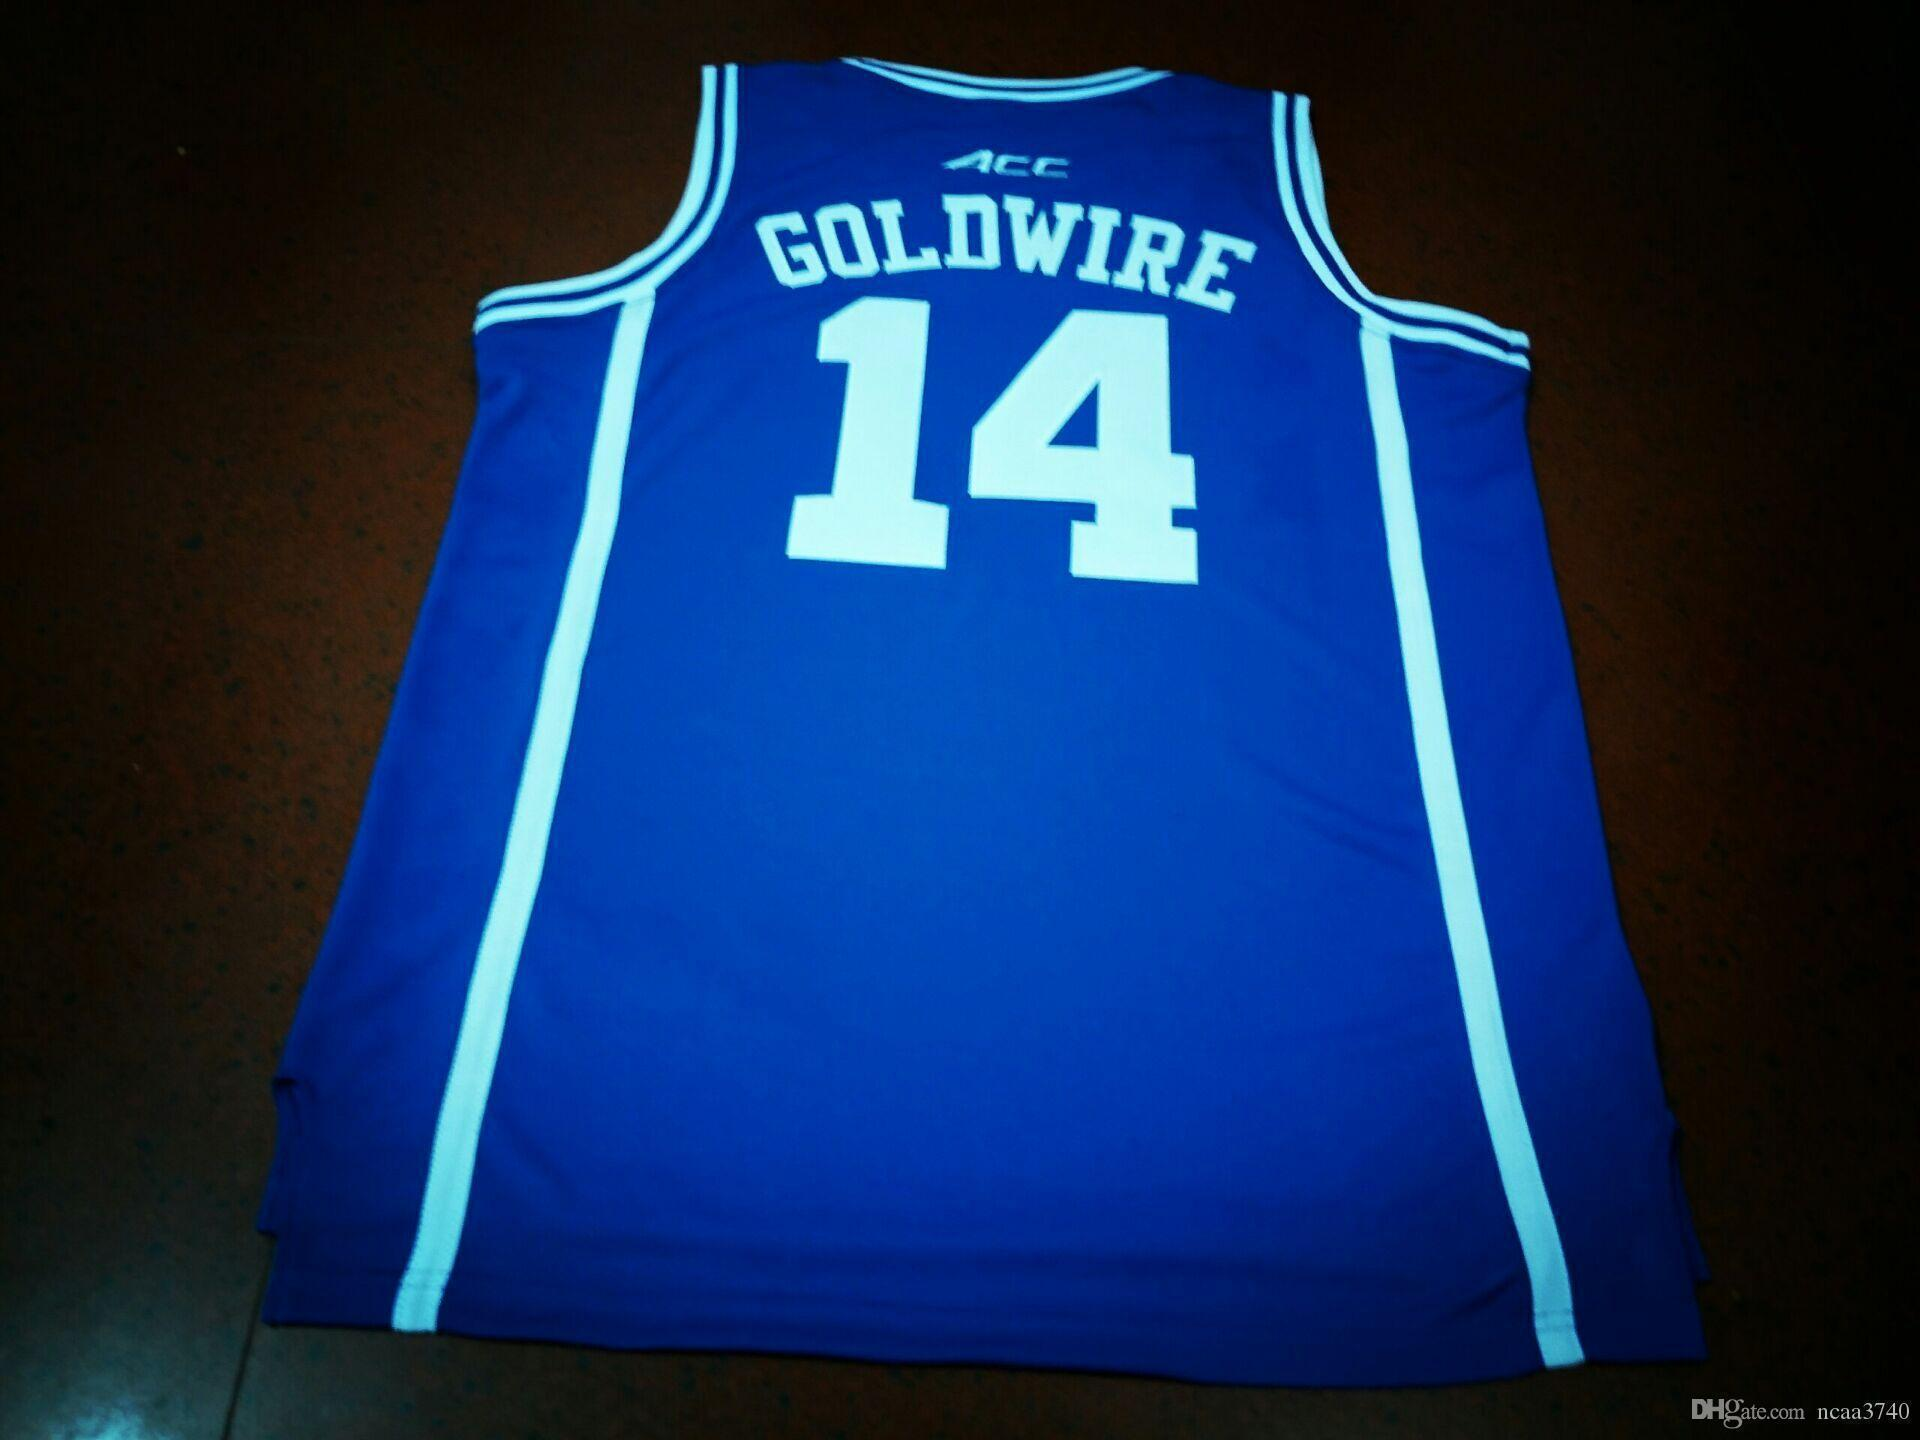 #14 GOLDWIRE